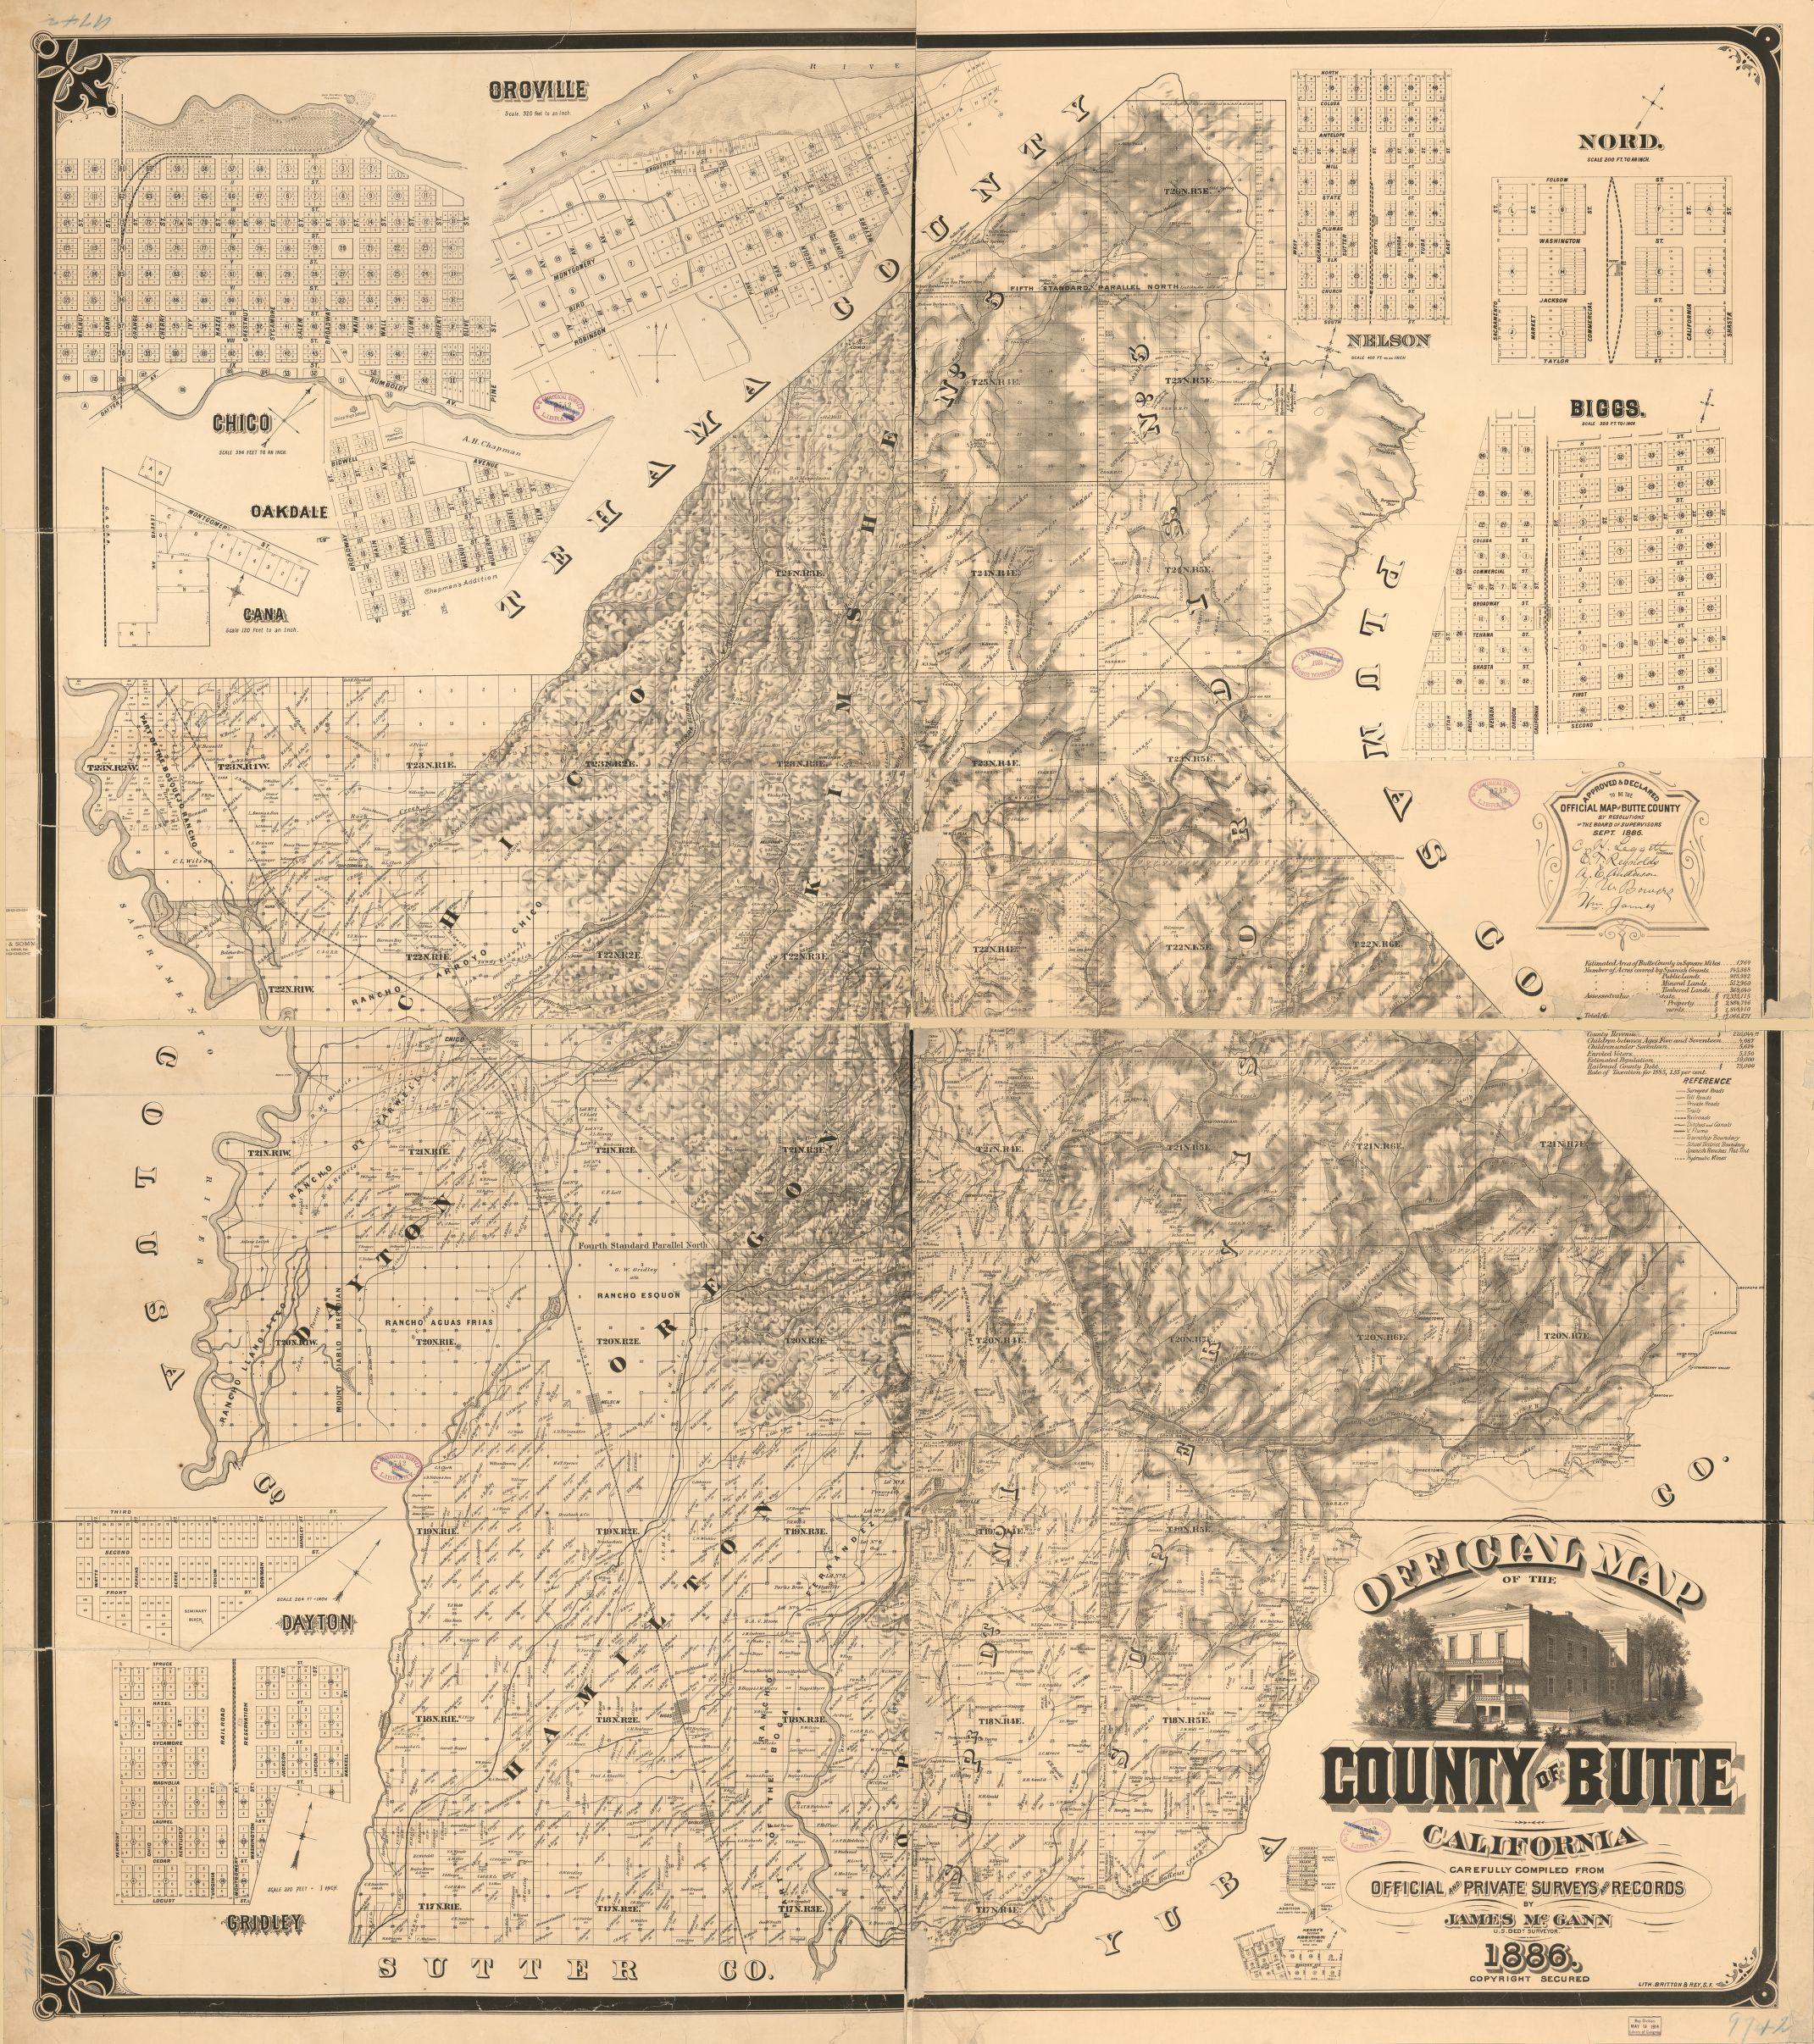 California Nevada Earthquake Index Map New Map California - Earthquake California Index Map